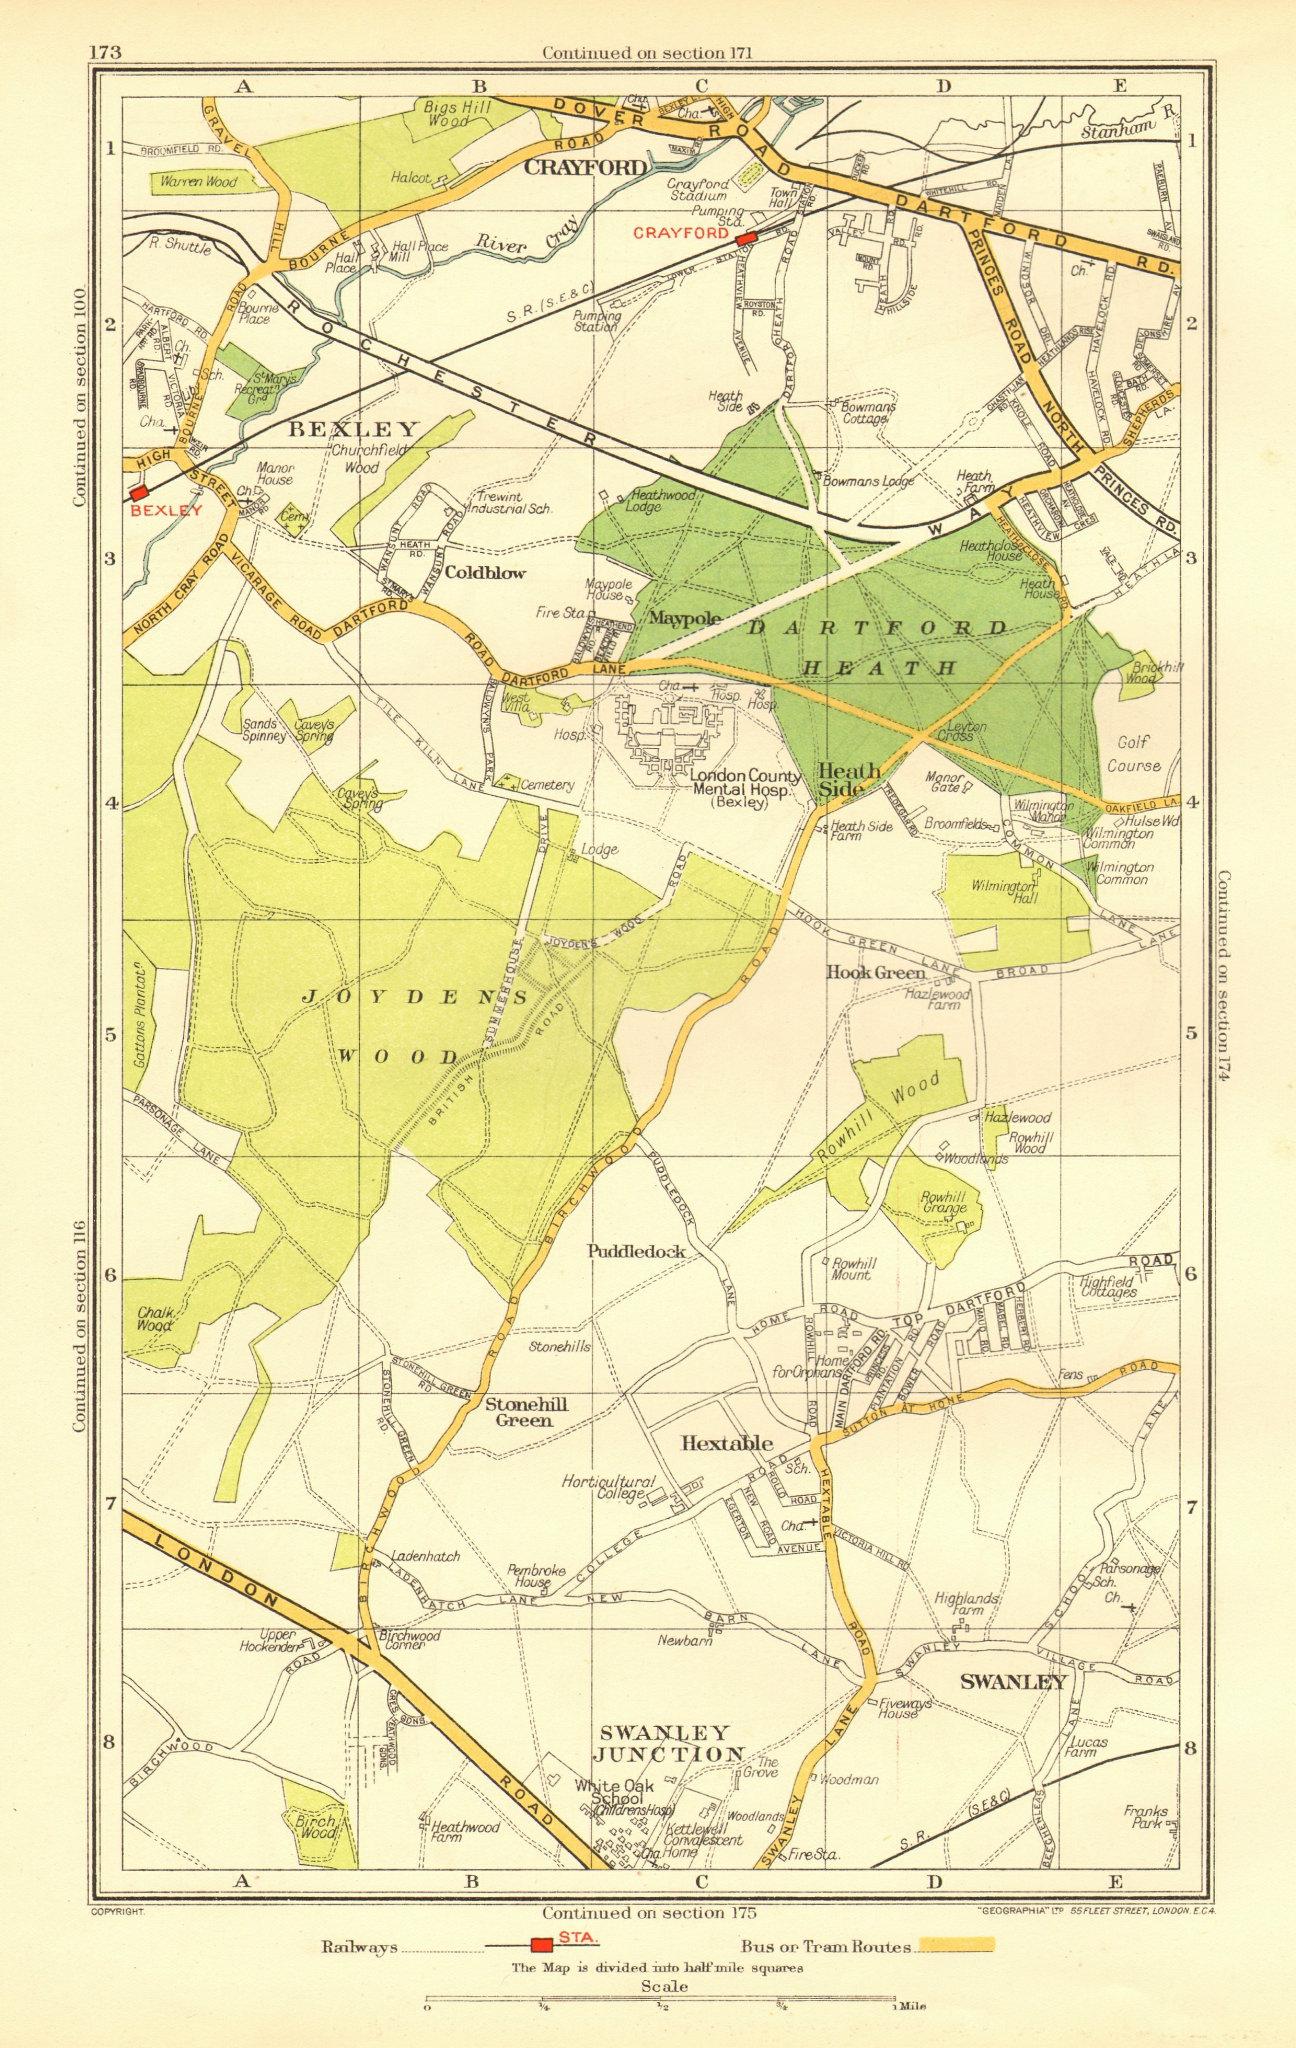 Associate Product DARTFORD. Crayford Hextable Old Bexley Swanley Hook Green White Oak 1937 map